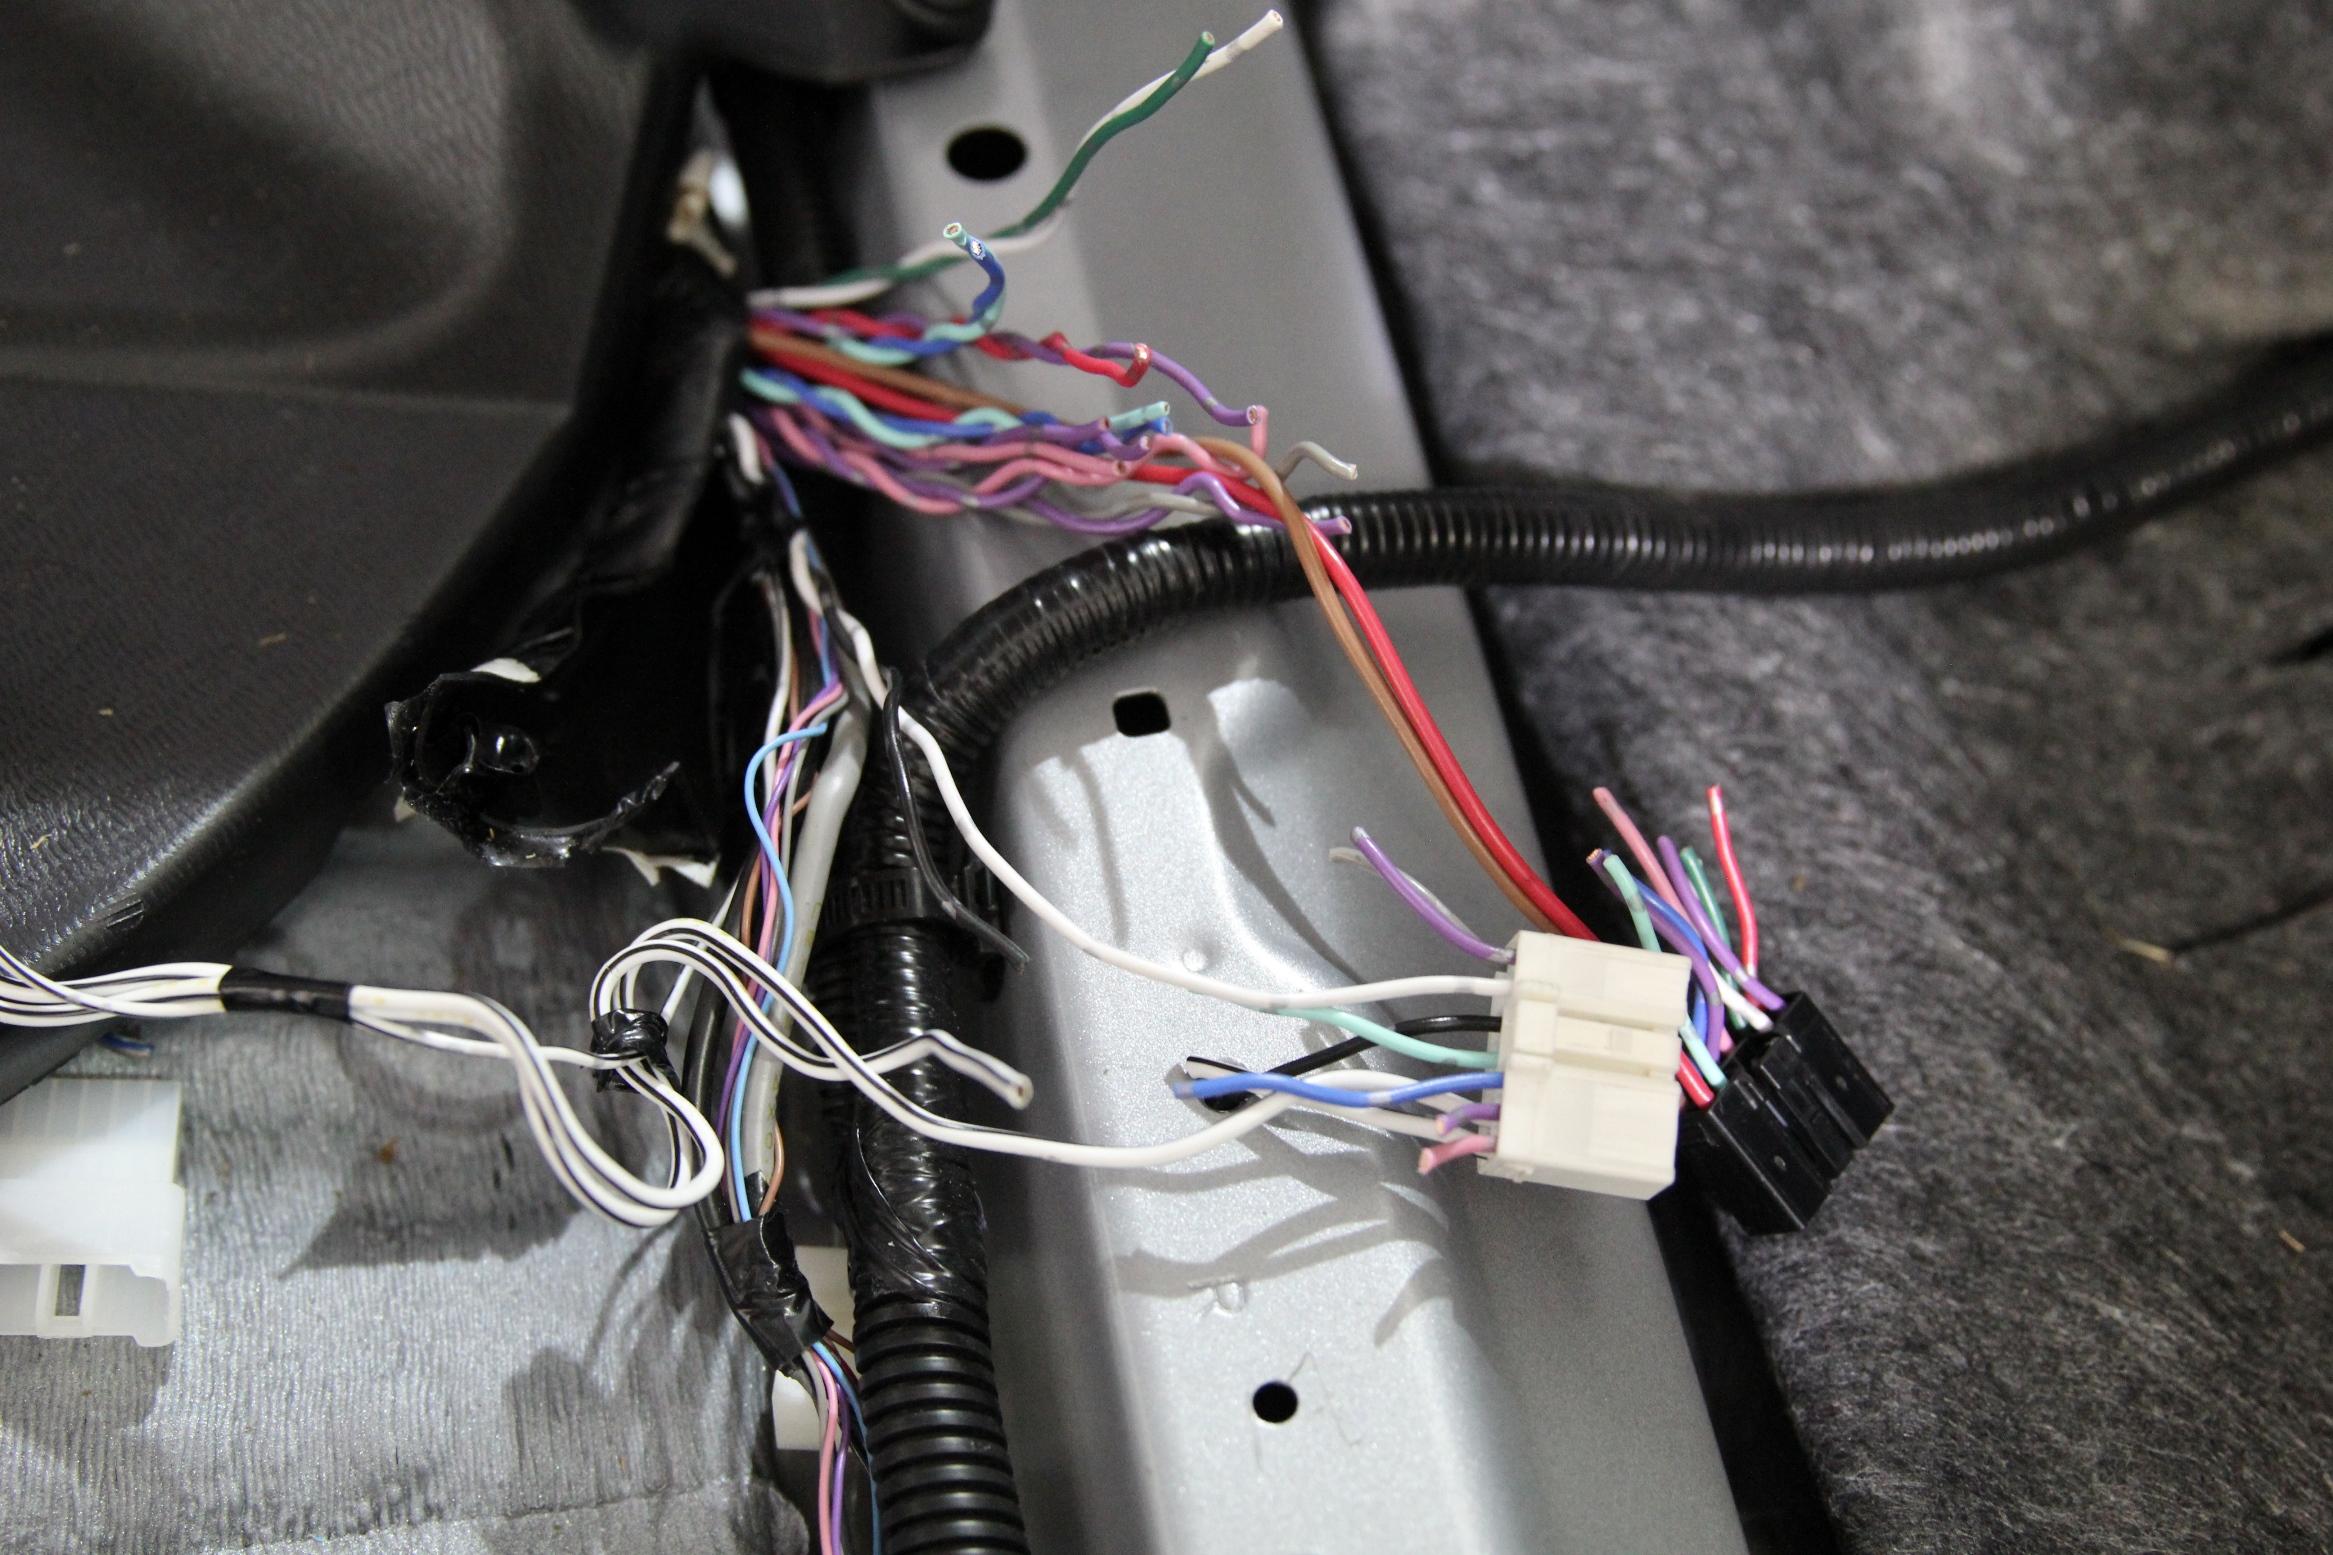 Tundra JBL Wiring Harness Repair Making New Harness 2?resize\\\=225%2C160 toyota jbl harness adapter wiring diagrams longlifeenergyenzymes com tao wiring harness replace at soozxer.org